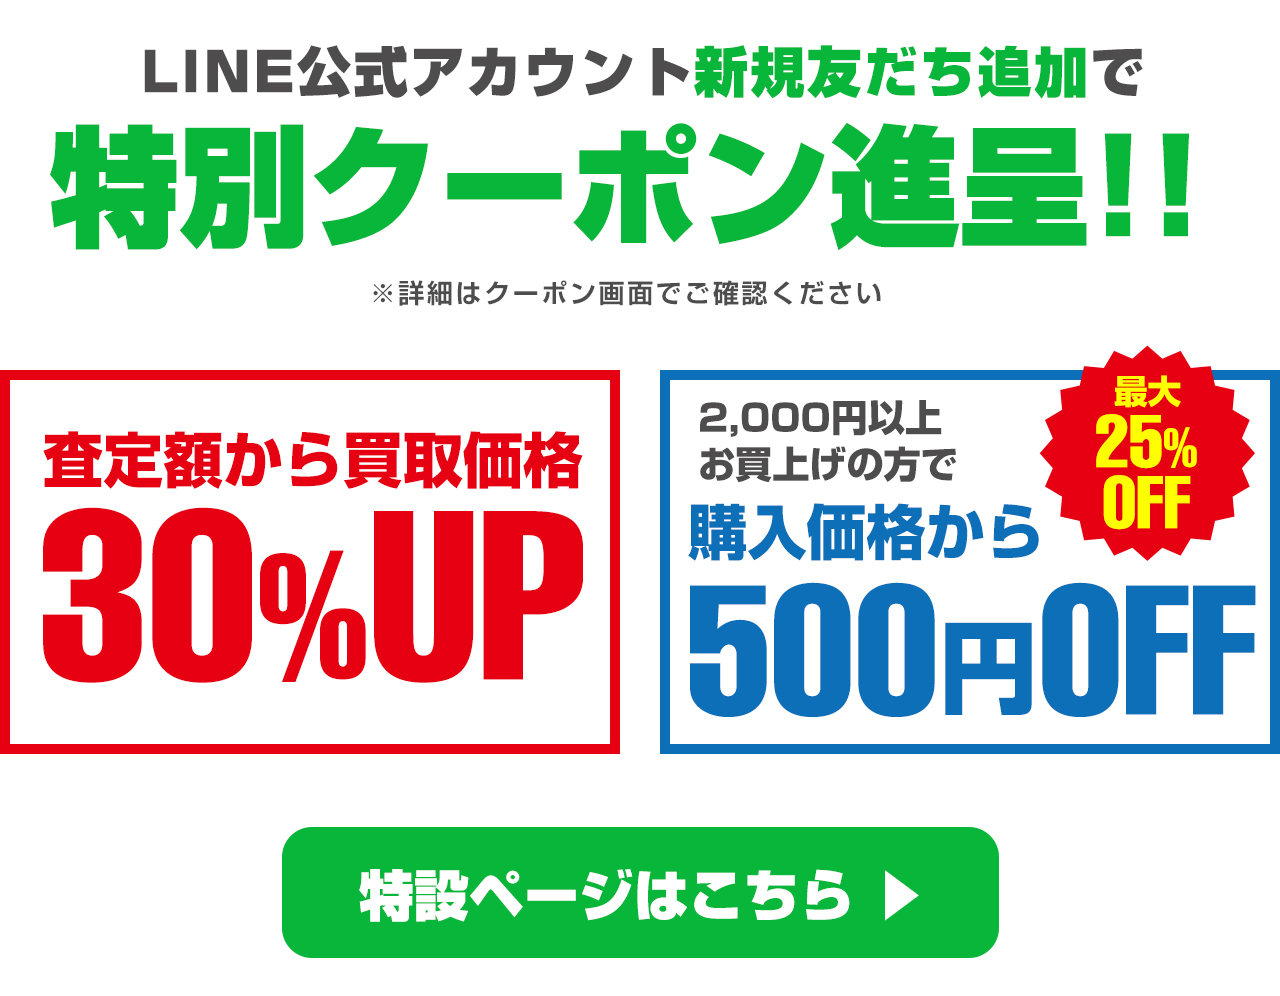 LINE@無料査定